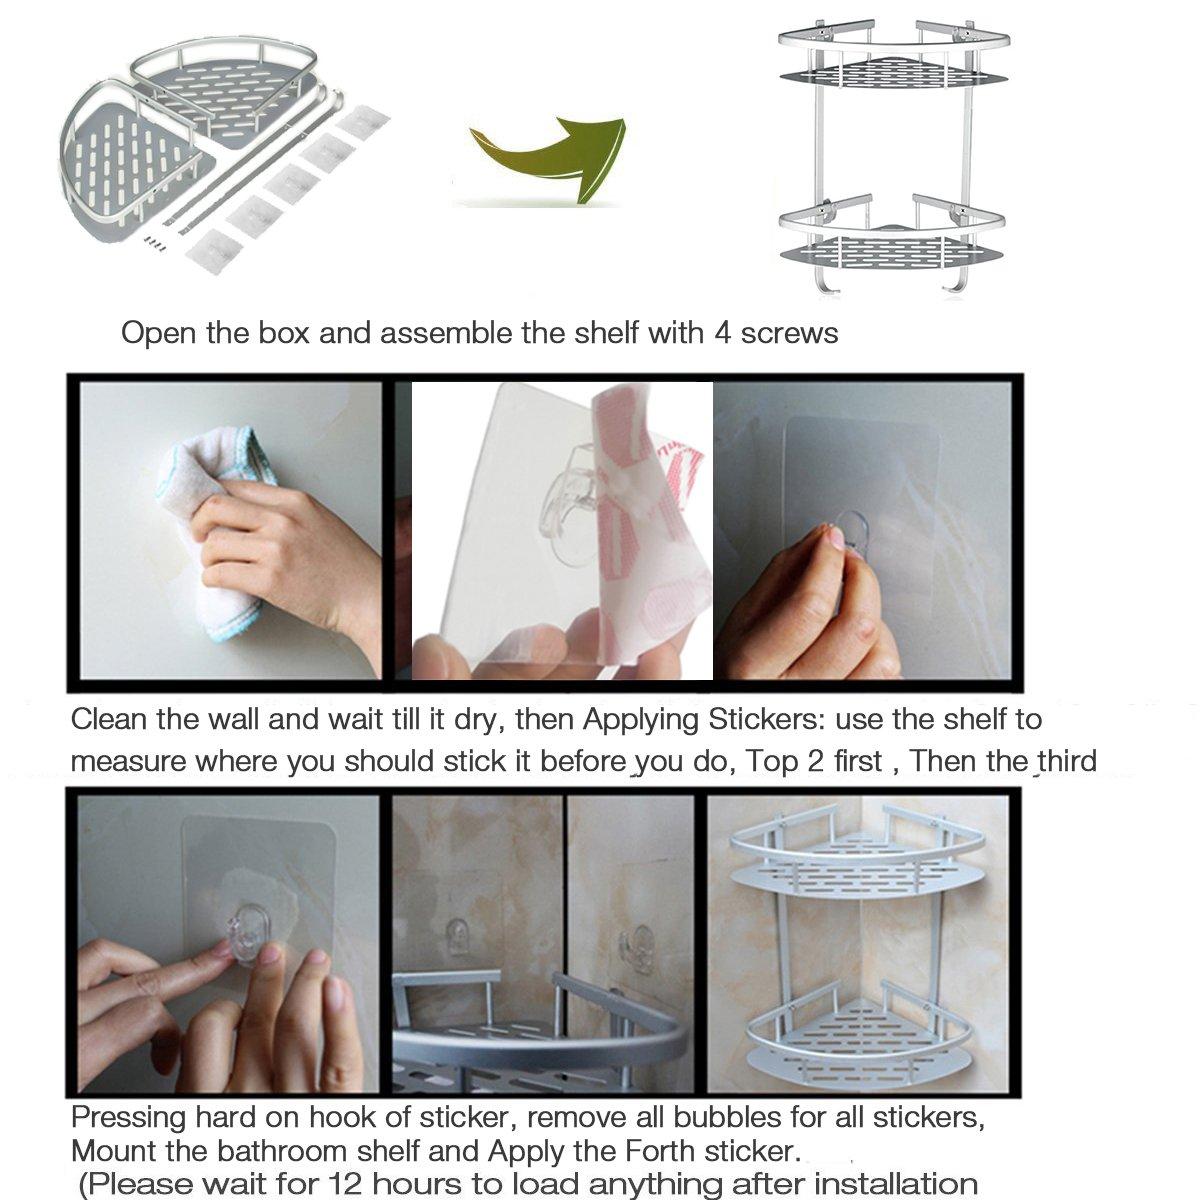 Lancher Bathroom Shelf (No Drilling) Durable Aluminum 2 tiers shower shelf Kitchen storage basket Adhesive Suction Corner Shelves Shower Caddy by Lancher (Image #2)